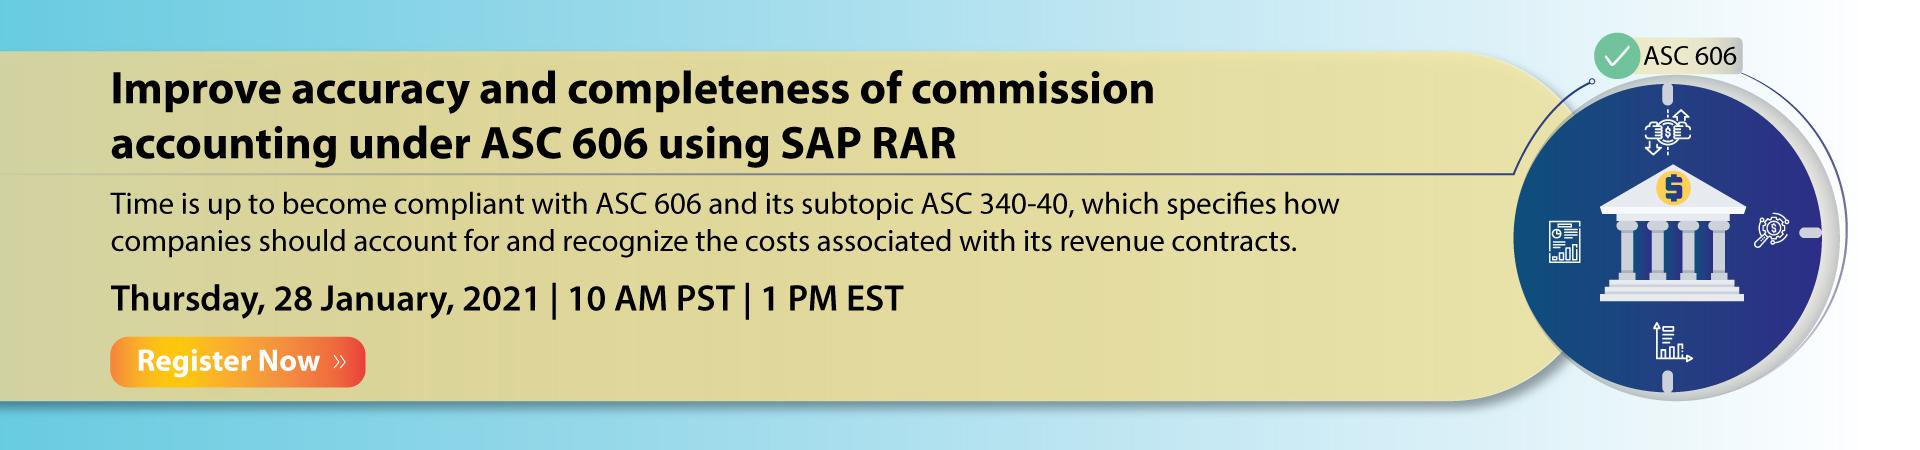 ASC 606 using SAP RAR Banner